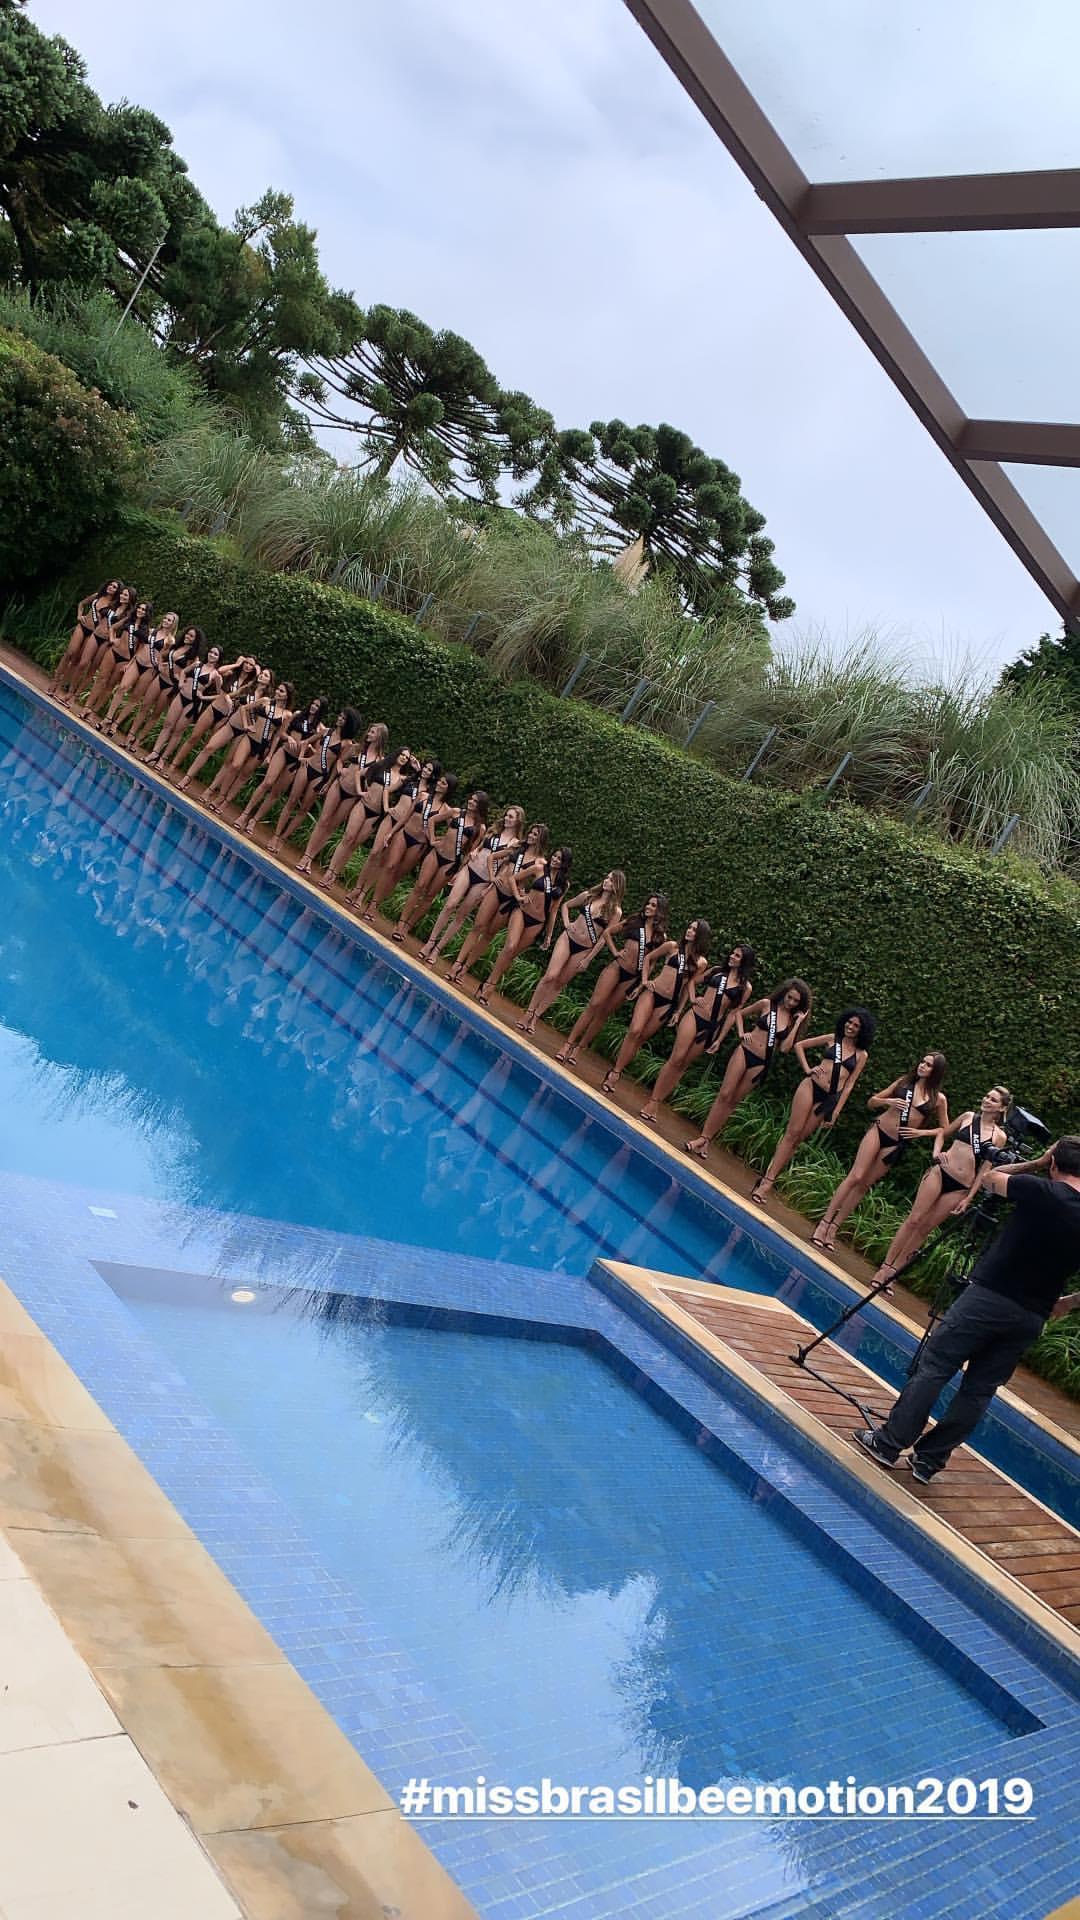 candidatas a miss brasil universo 2019 de bikini.  - Página 3 O6wjdthh